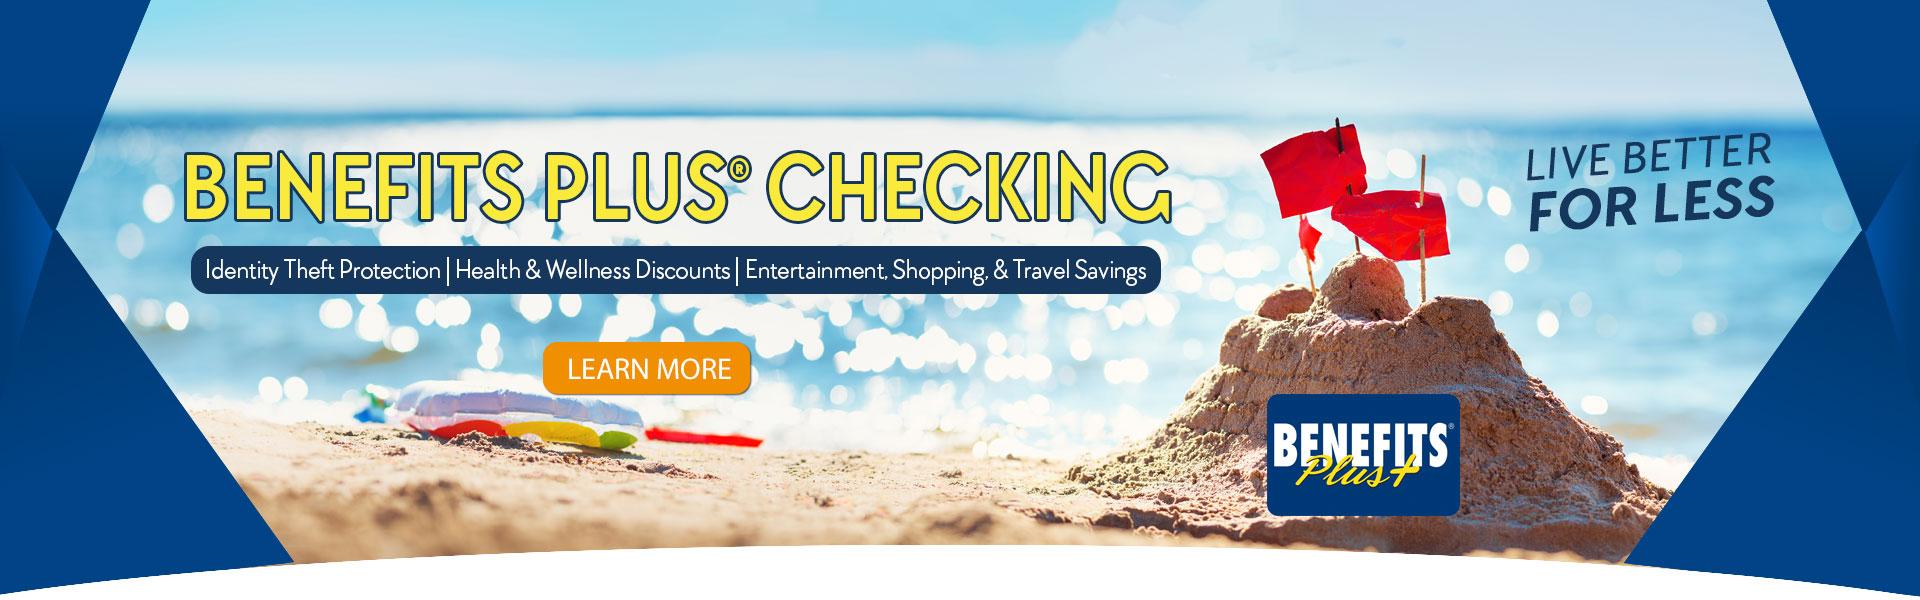 Benefits Plus Checking